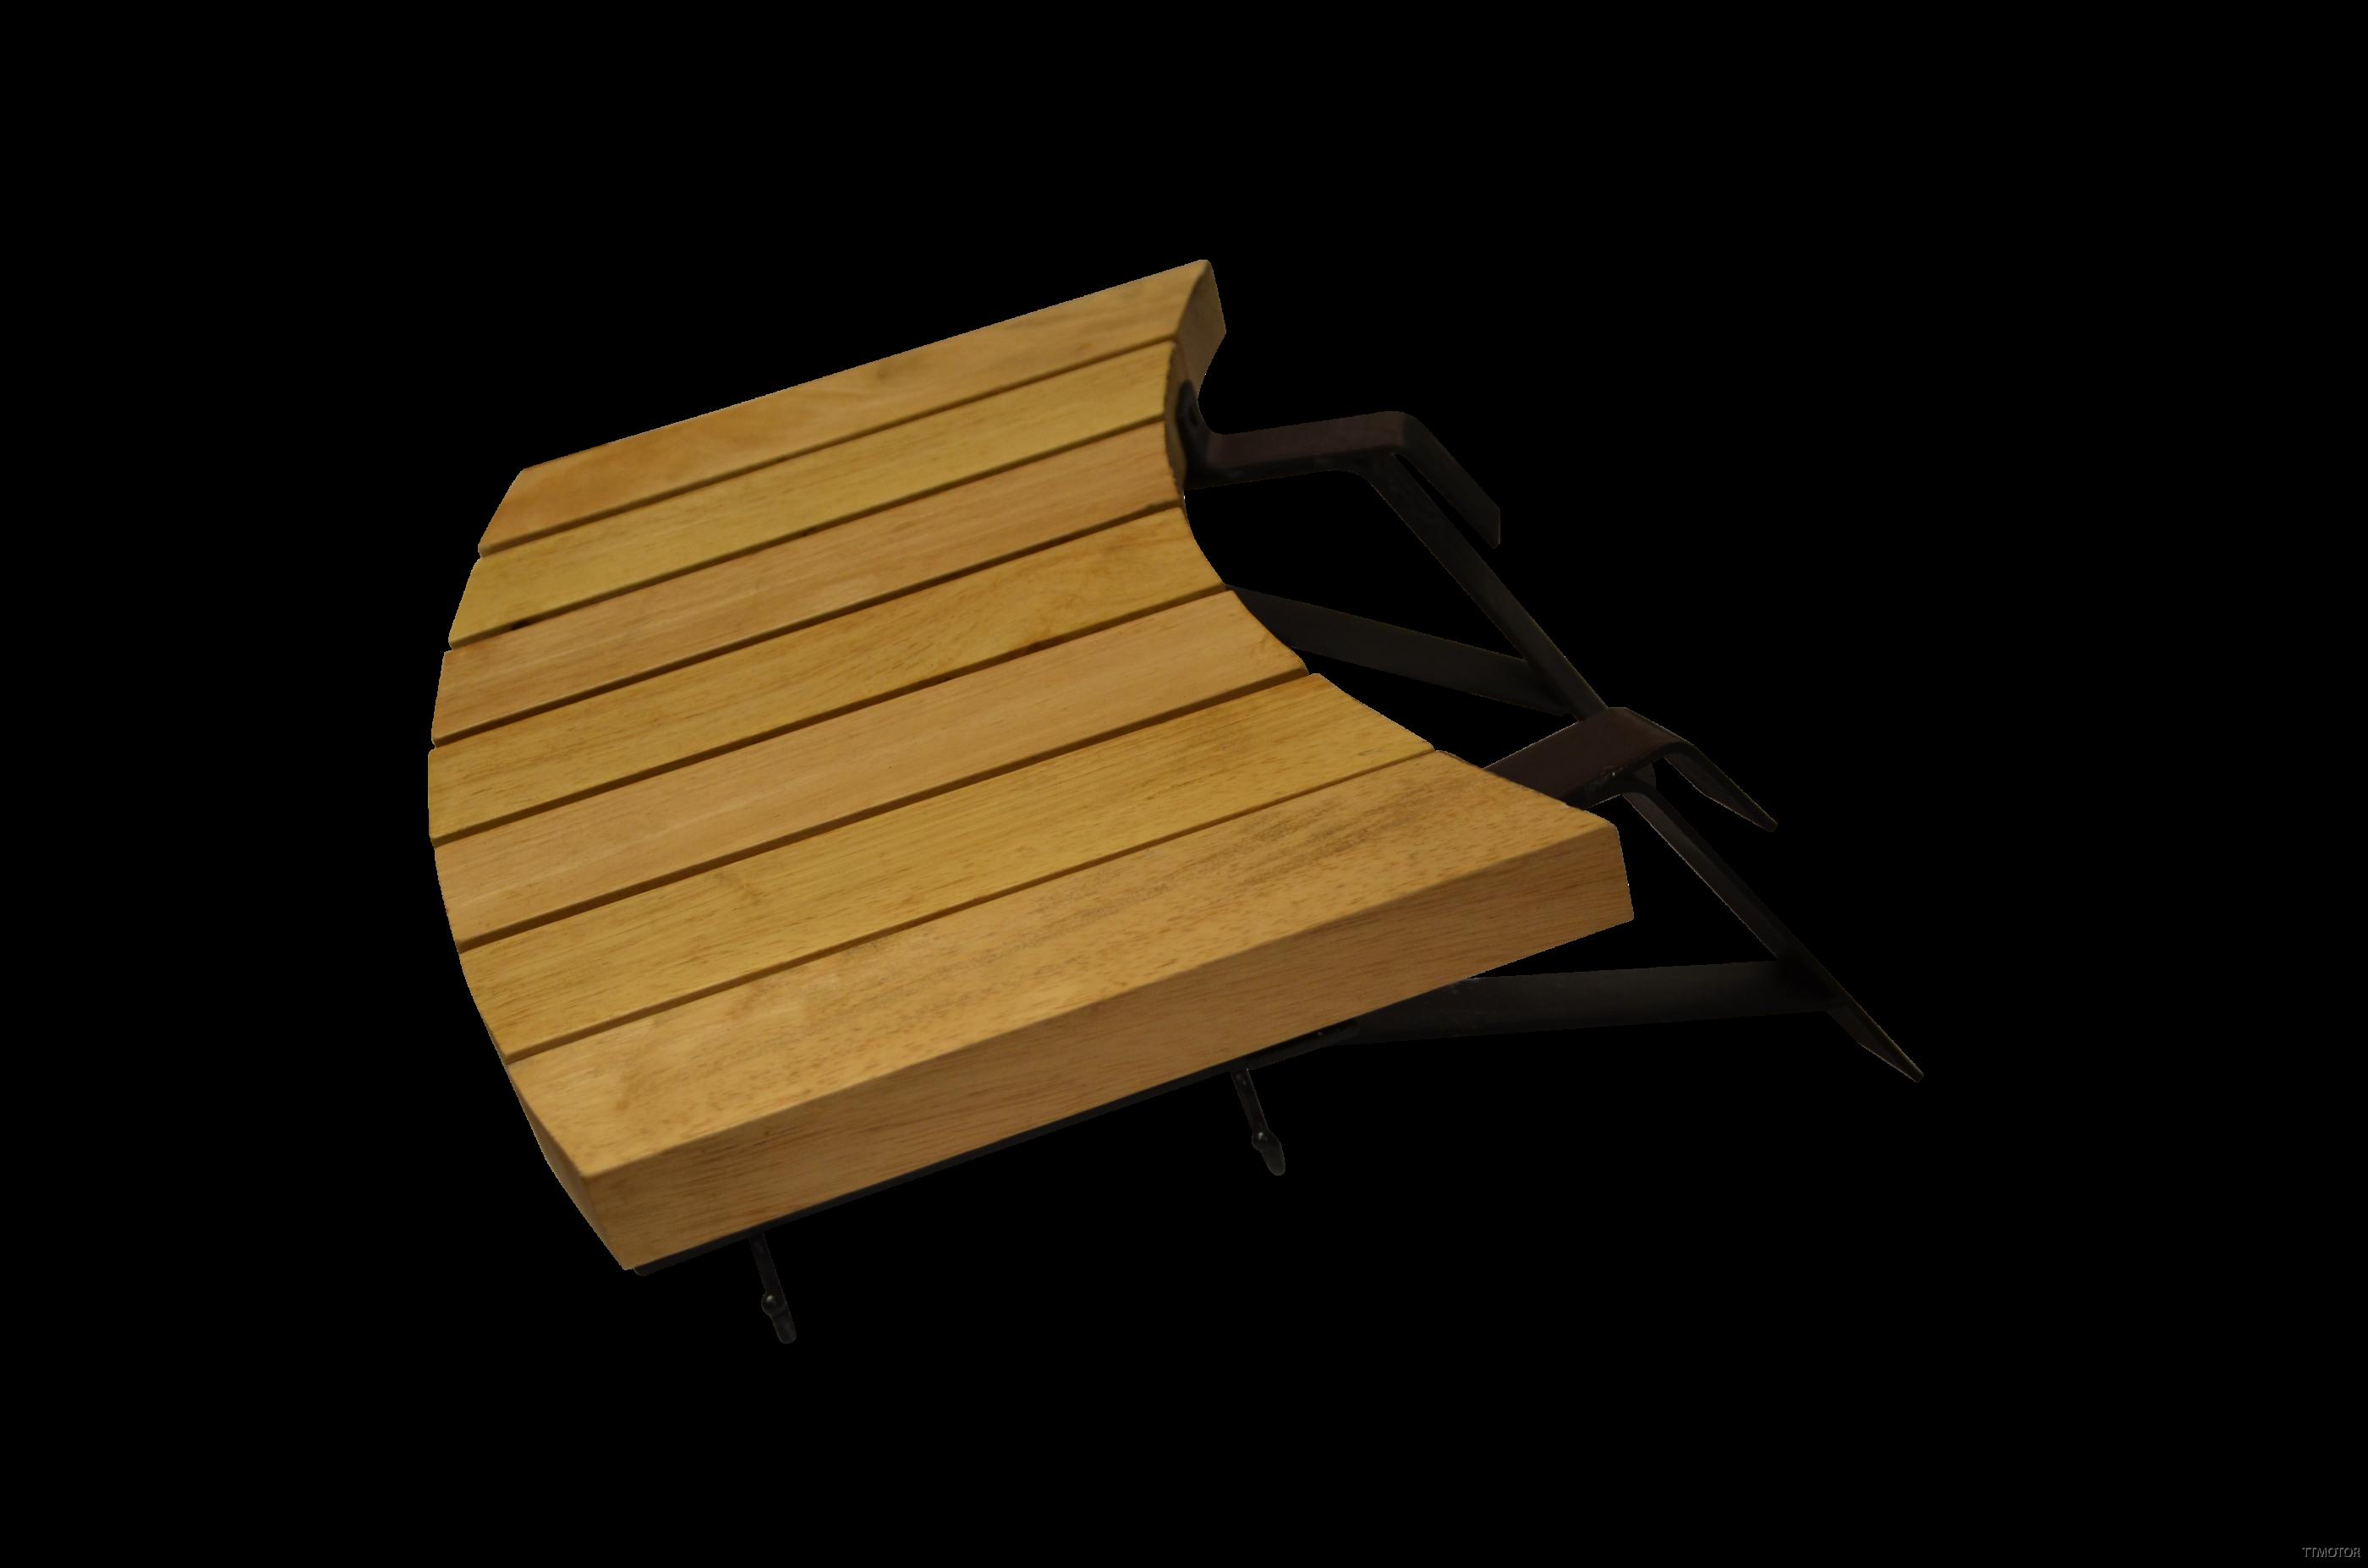 pangourmet-original-avstallningshyllor-3pack-bild2-1005